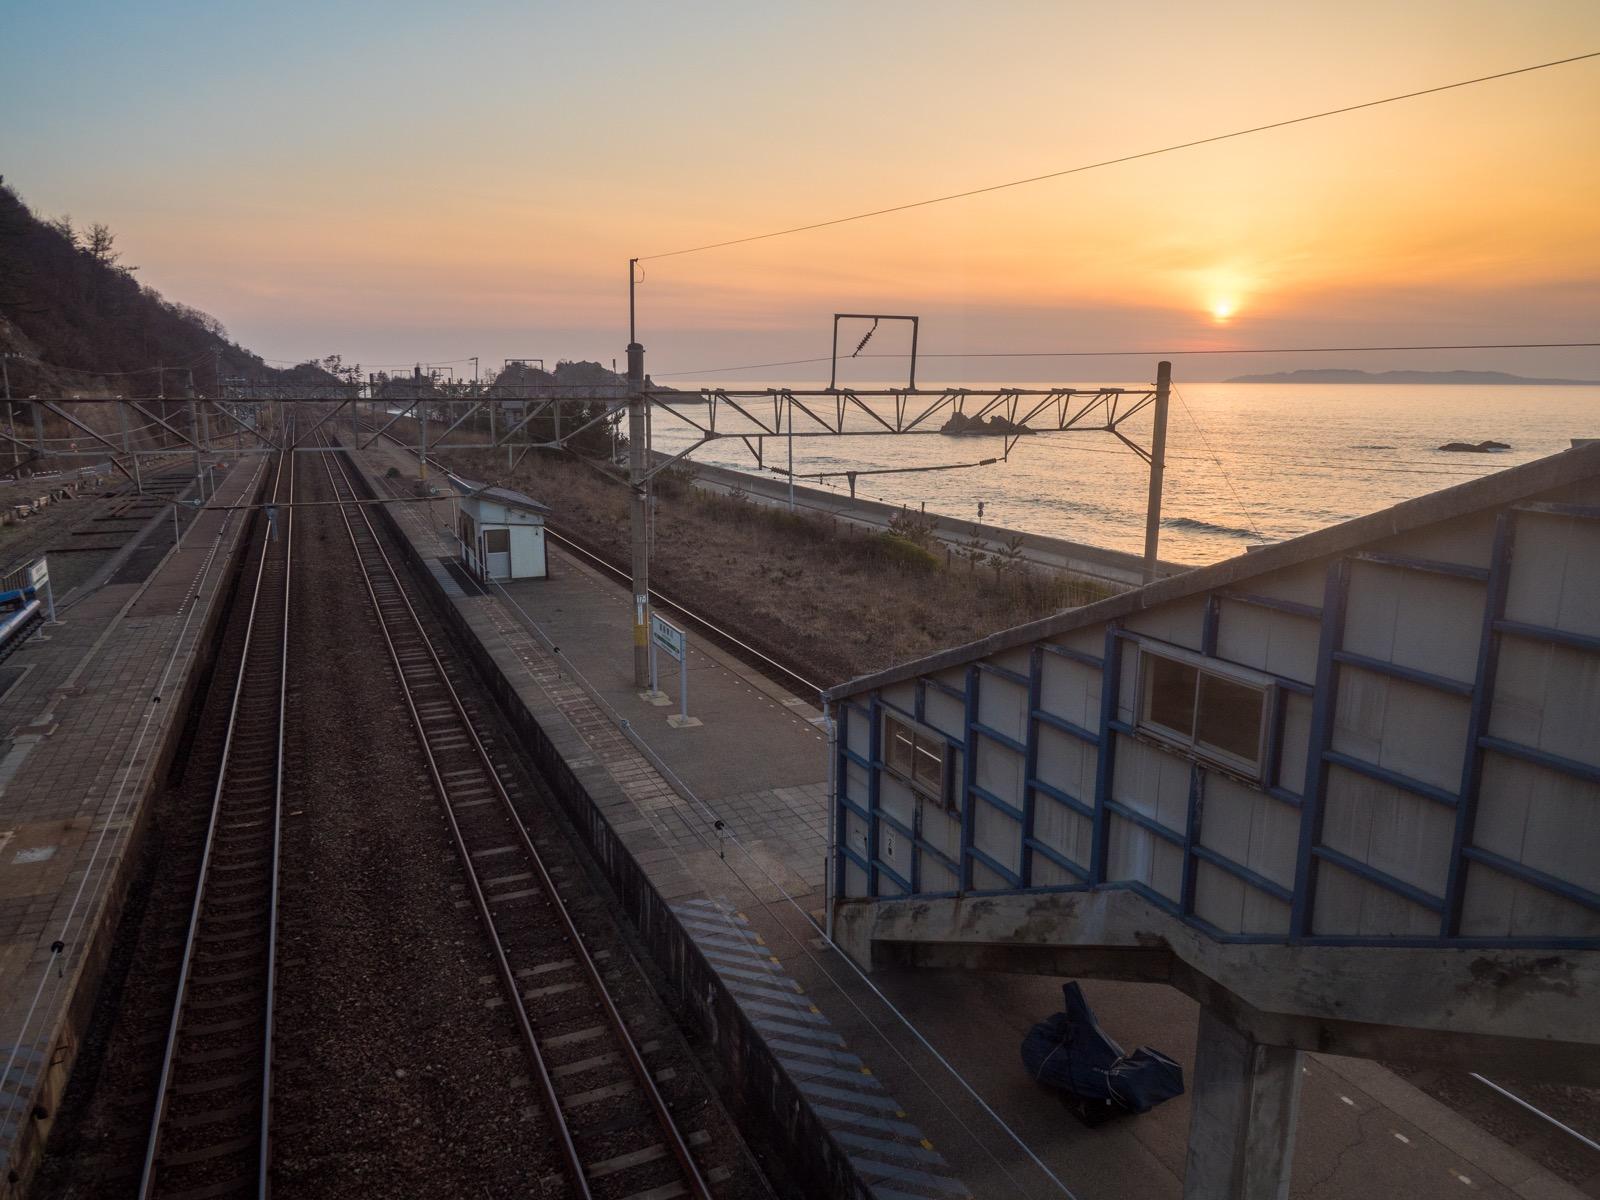 越後寒川駅の跨線橋から見た日本海